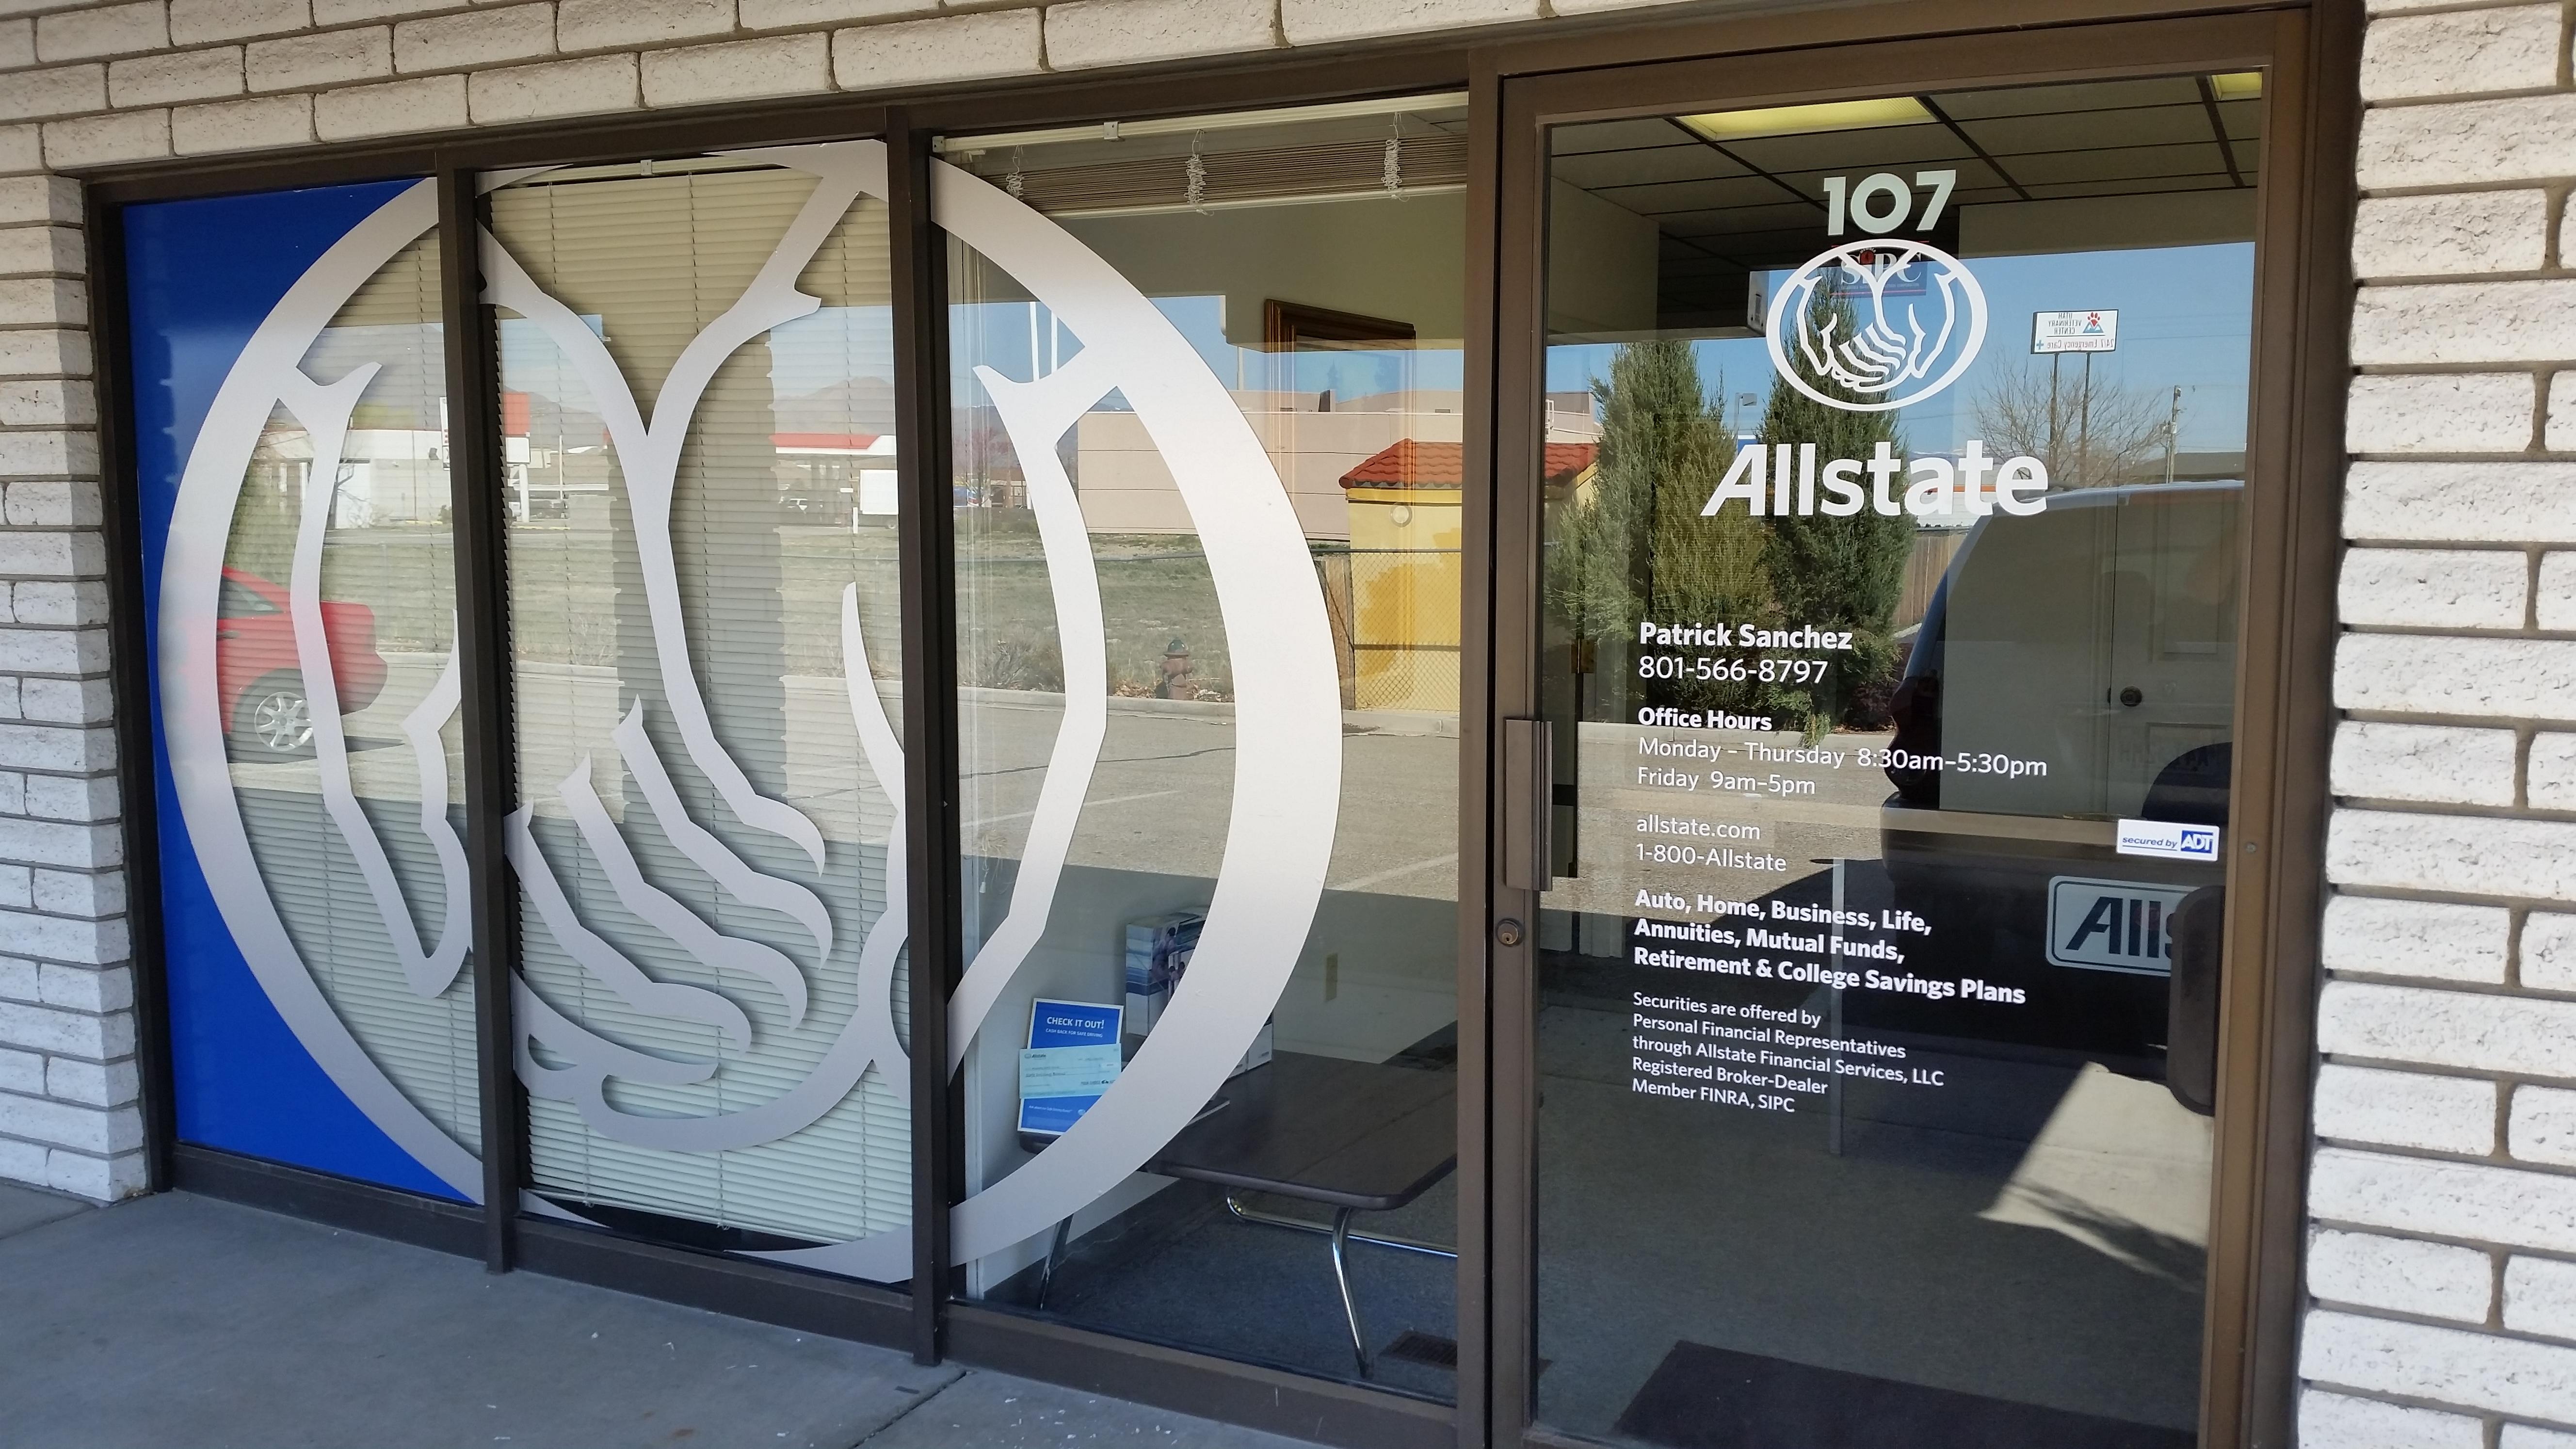 Patrick Sanchez: Allstate Insurance image 3